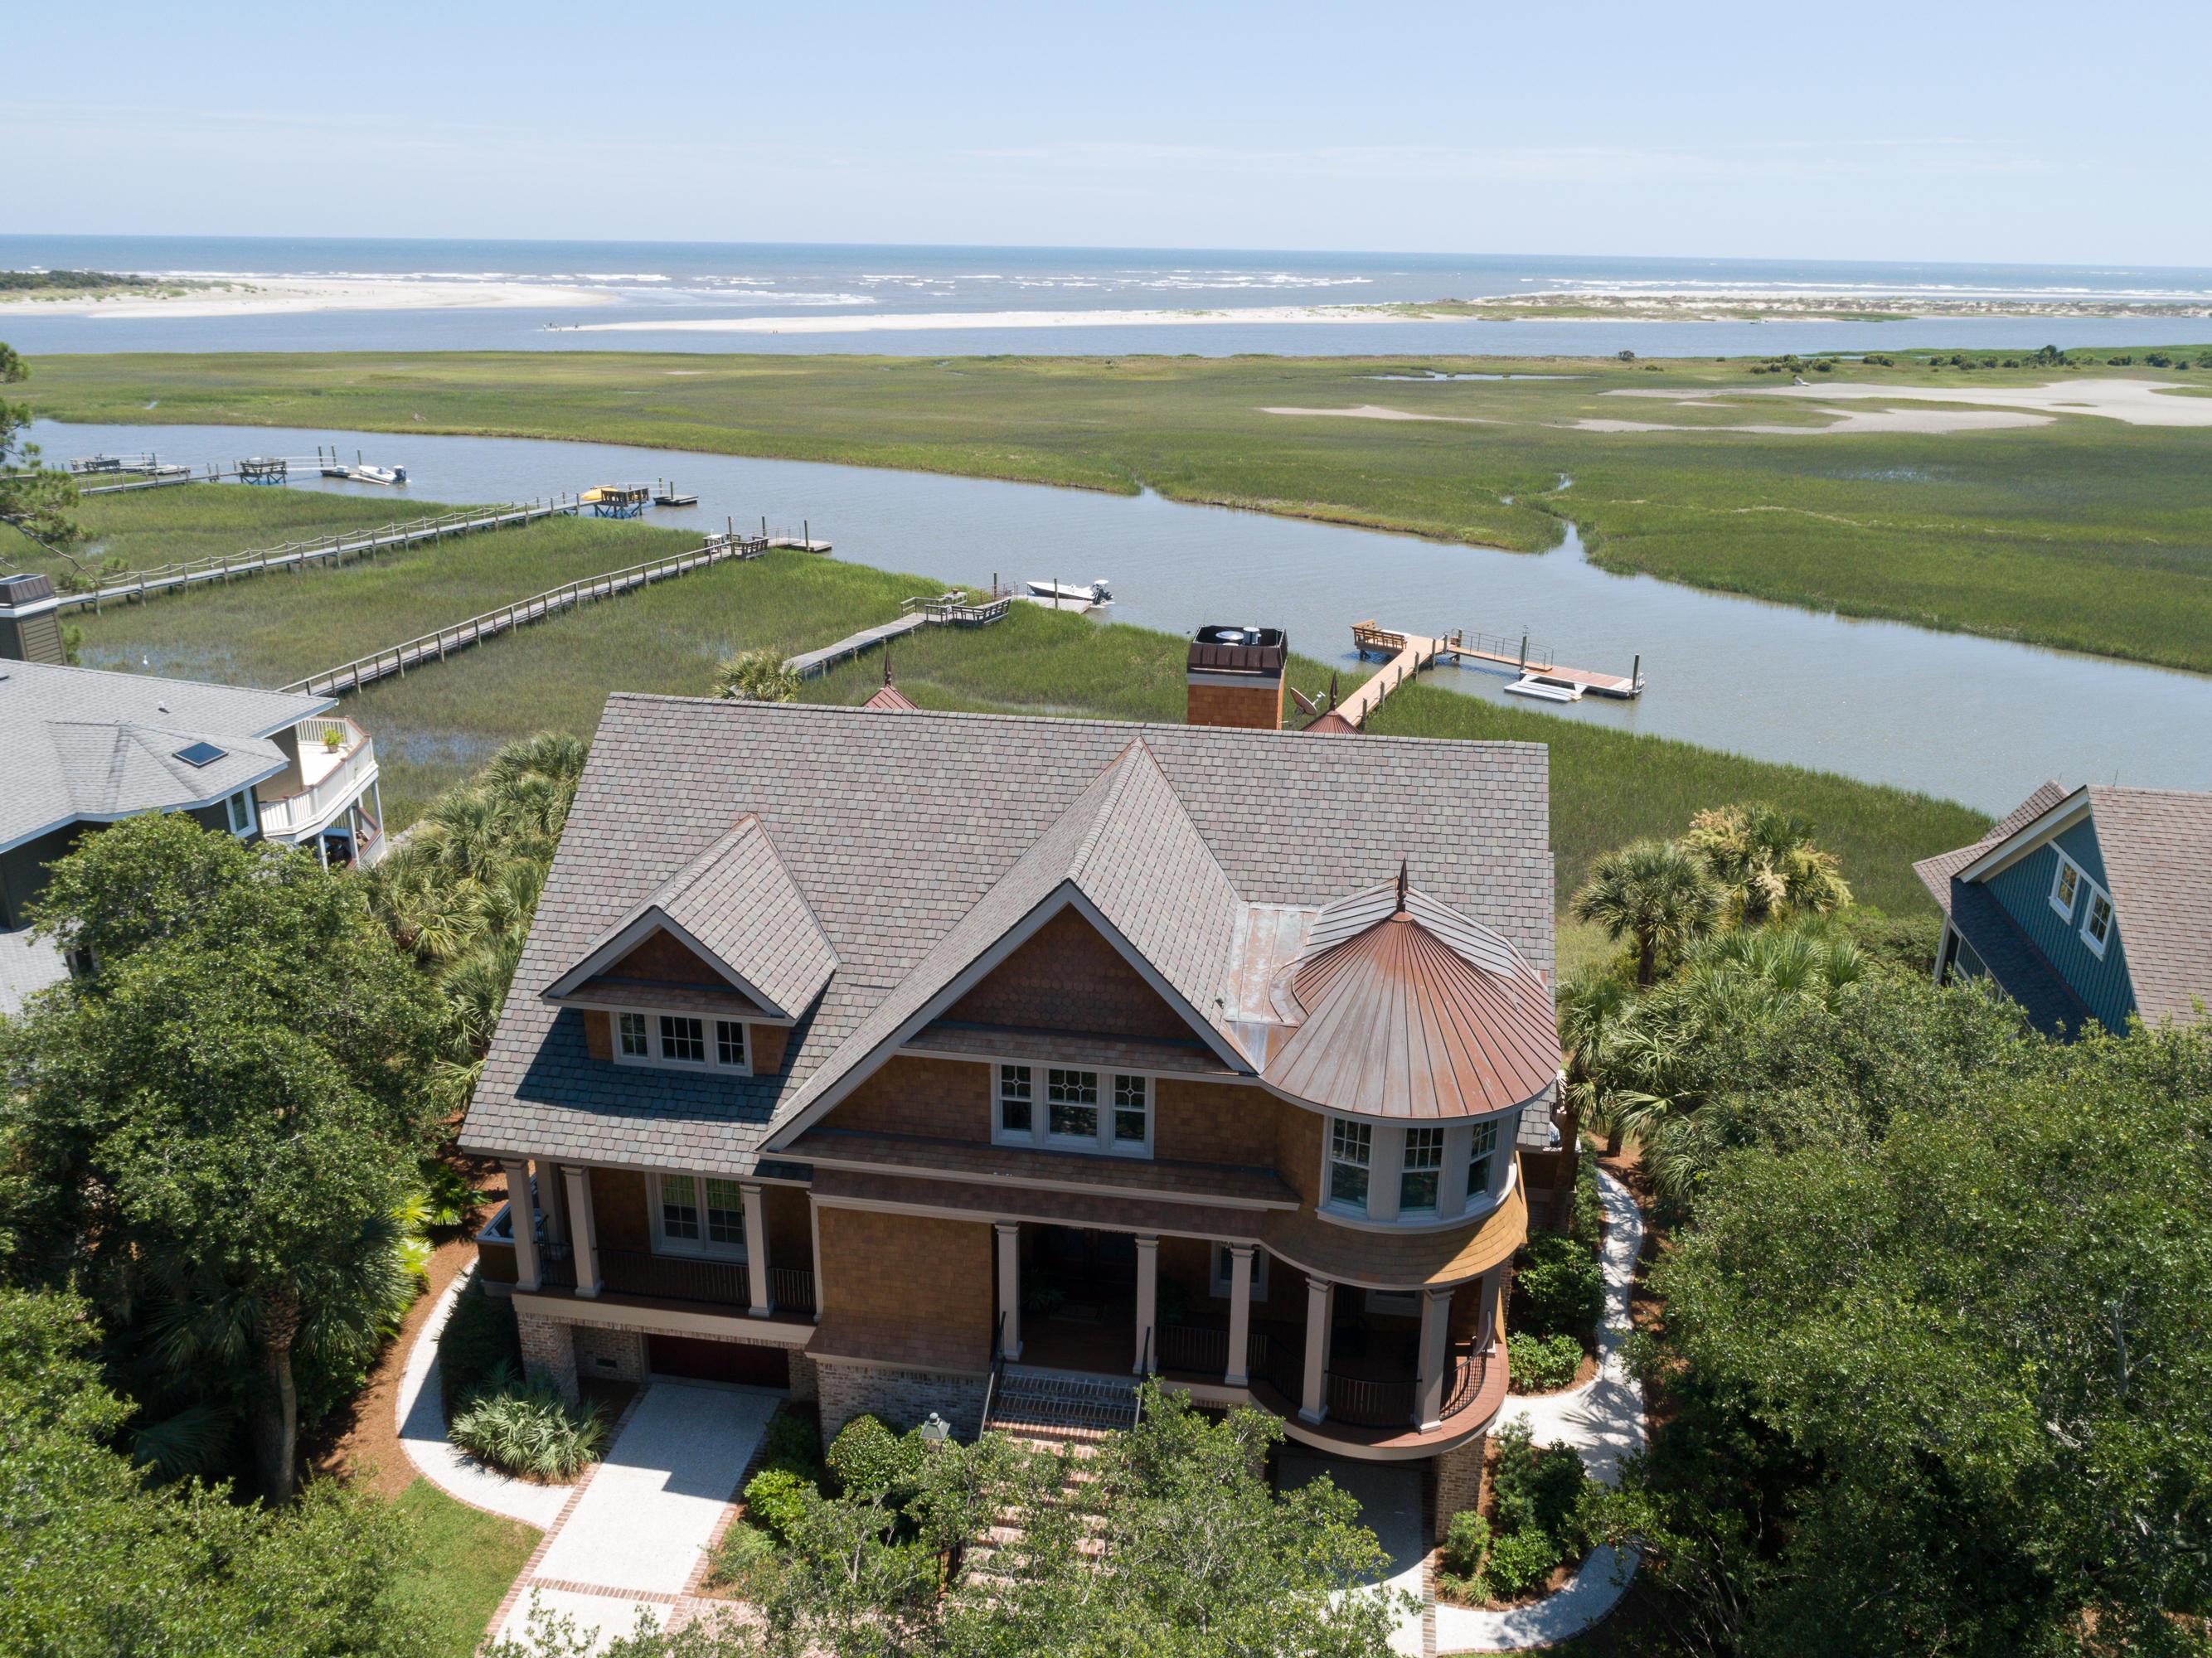 Seabrook Island Homes For Sale - 3037 Marshgate, Johns Island, SC - 15